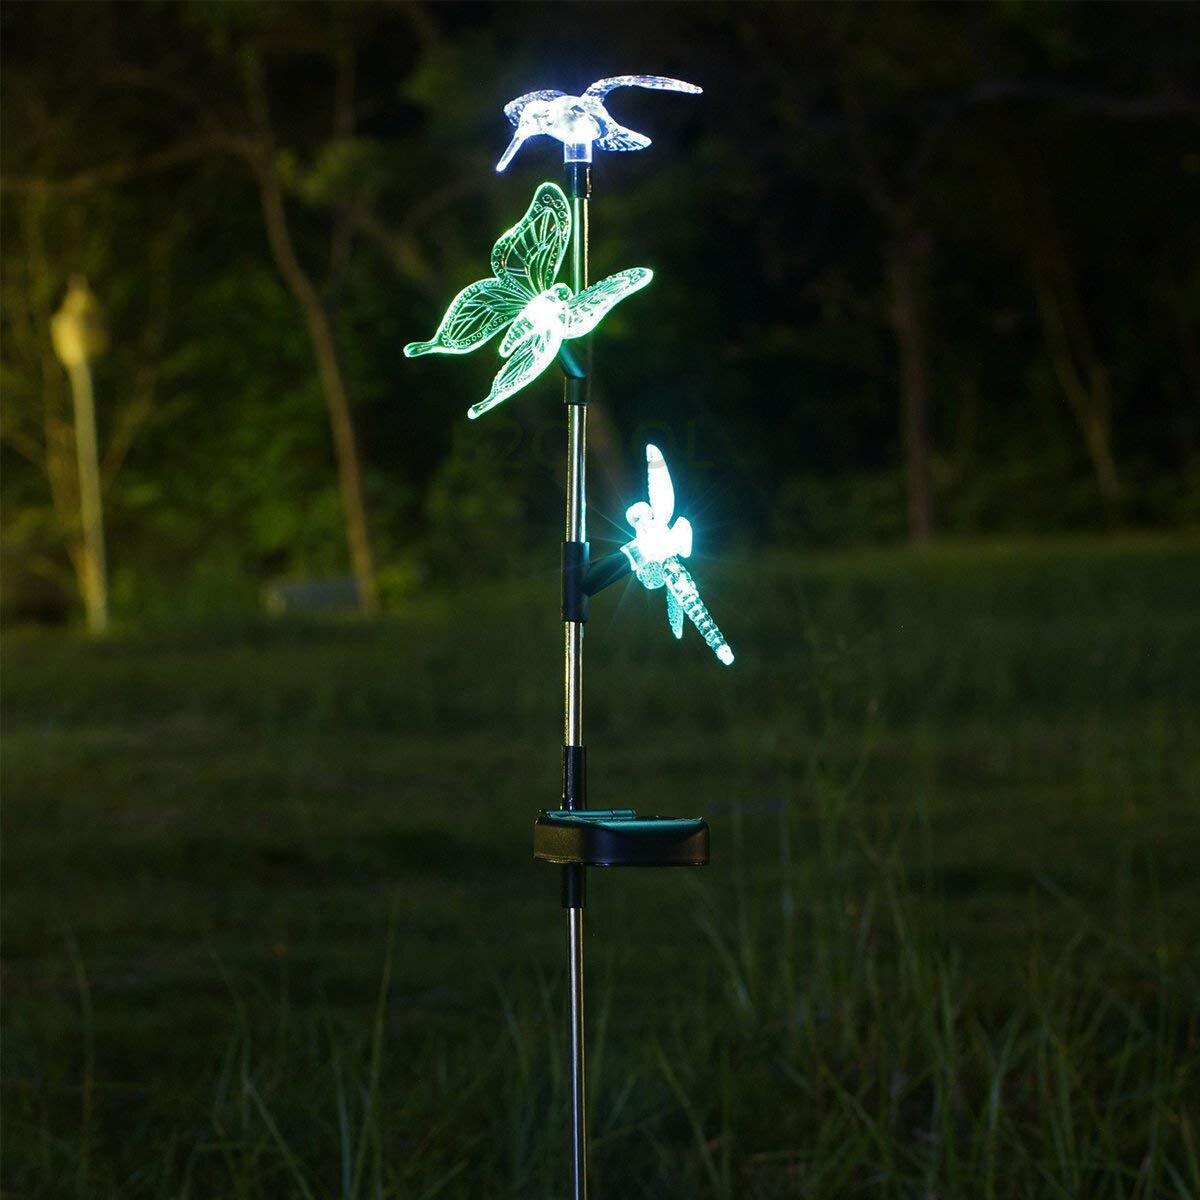 Brand New Outdoor Solar Garden Bird LED Light Butterfly Dragonfly Solar Garden Stake Light Stainless Steel Stake Chameleon co in Outdoor Wall Lamps from Lights Lighting